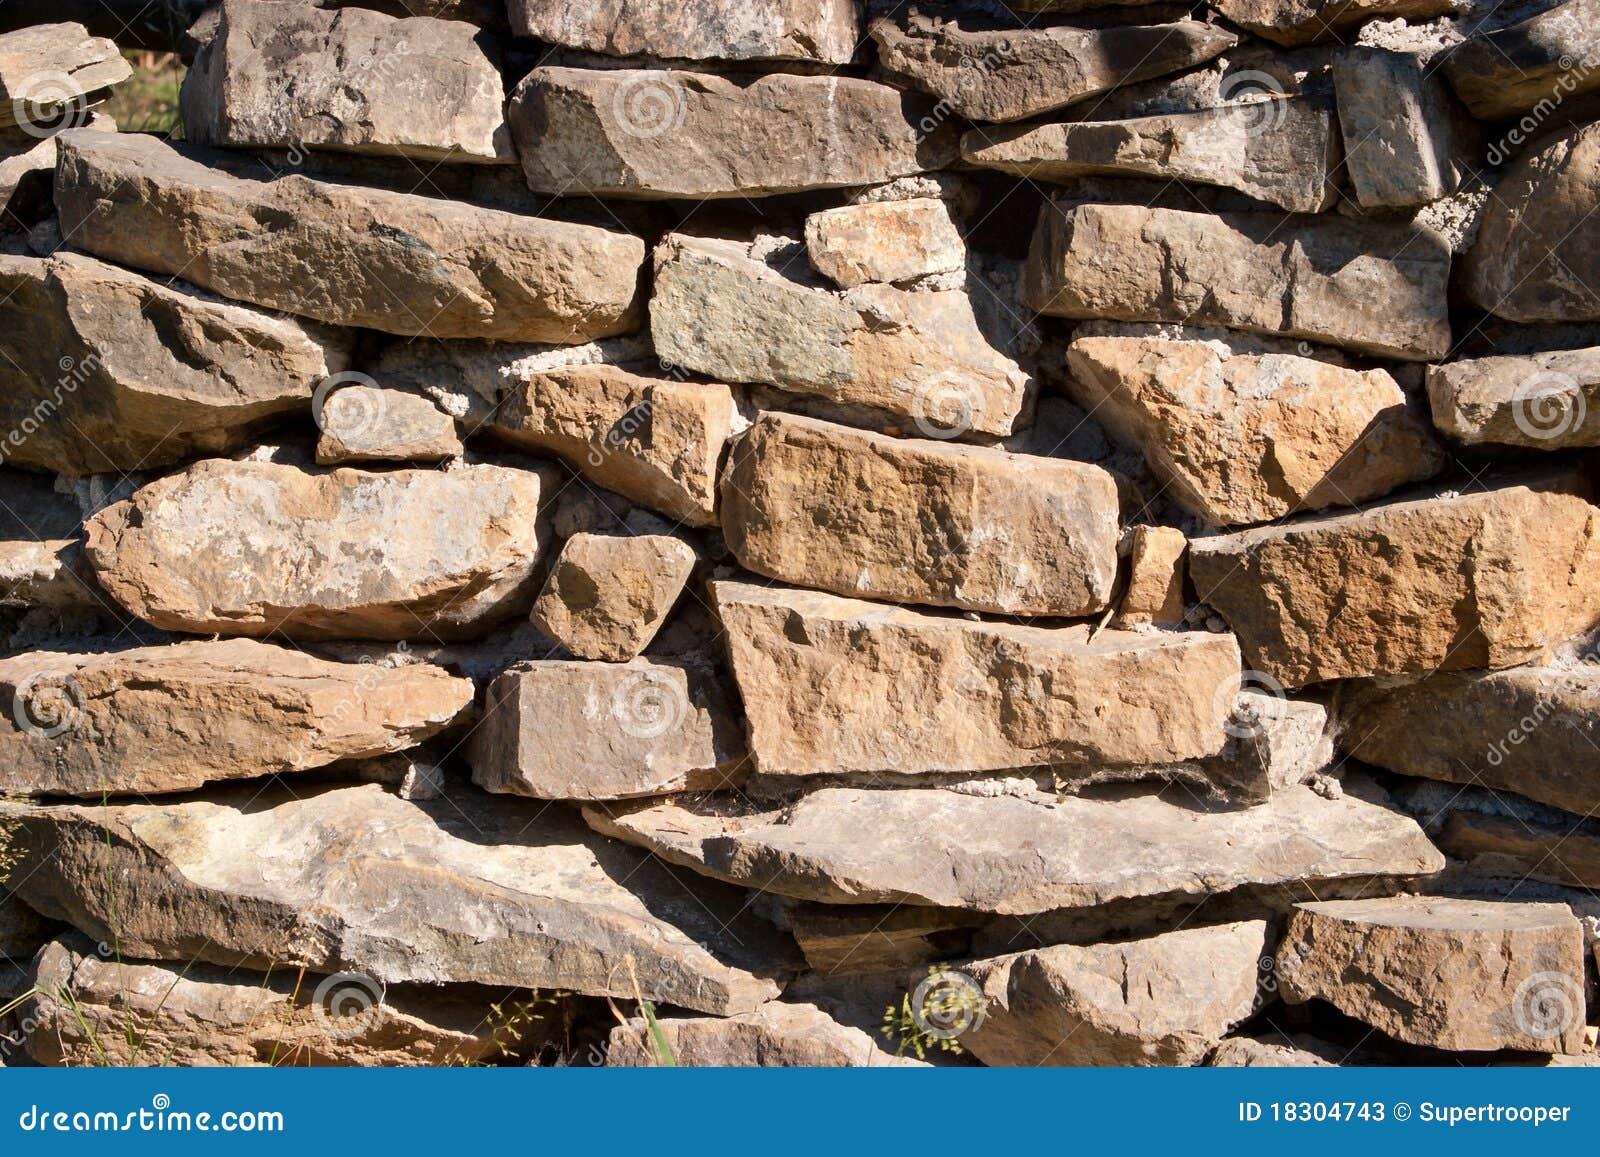 Rough Granite Stone : Rough natural stone stock photos image